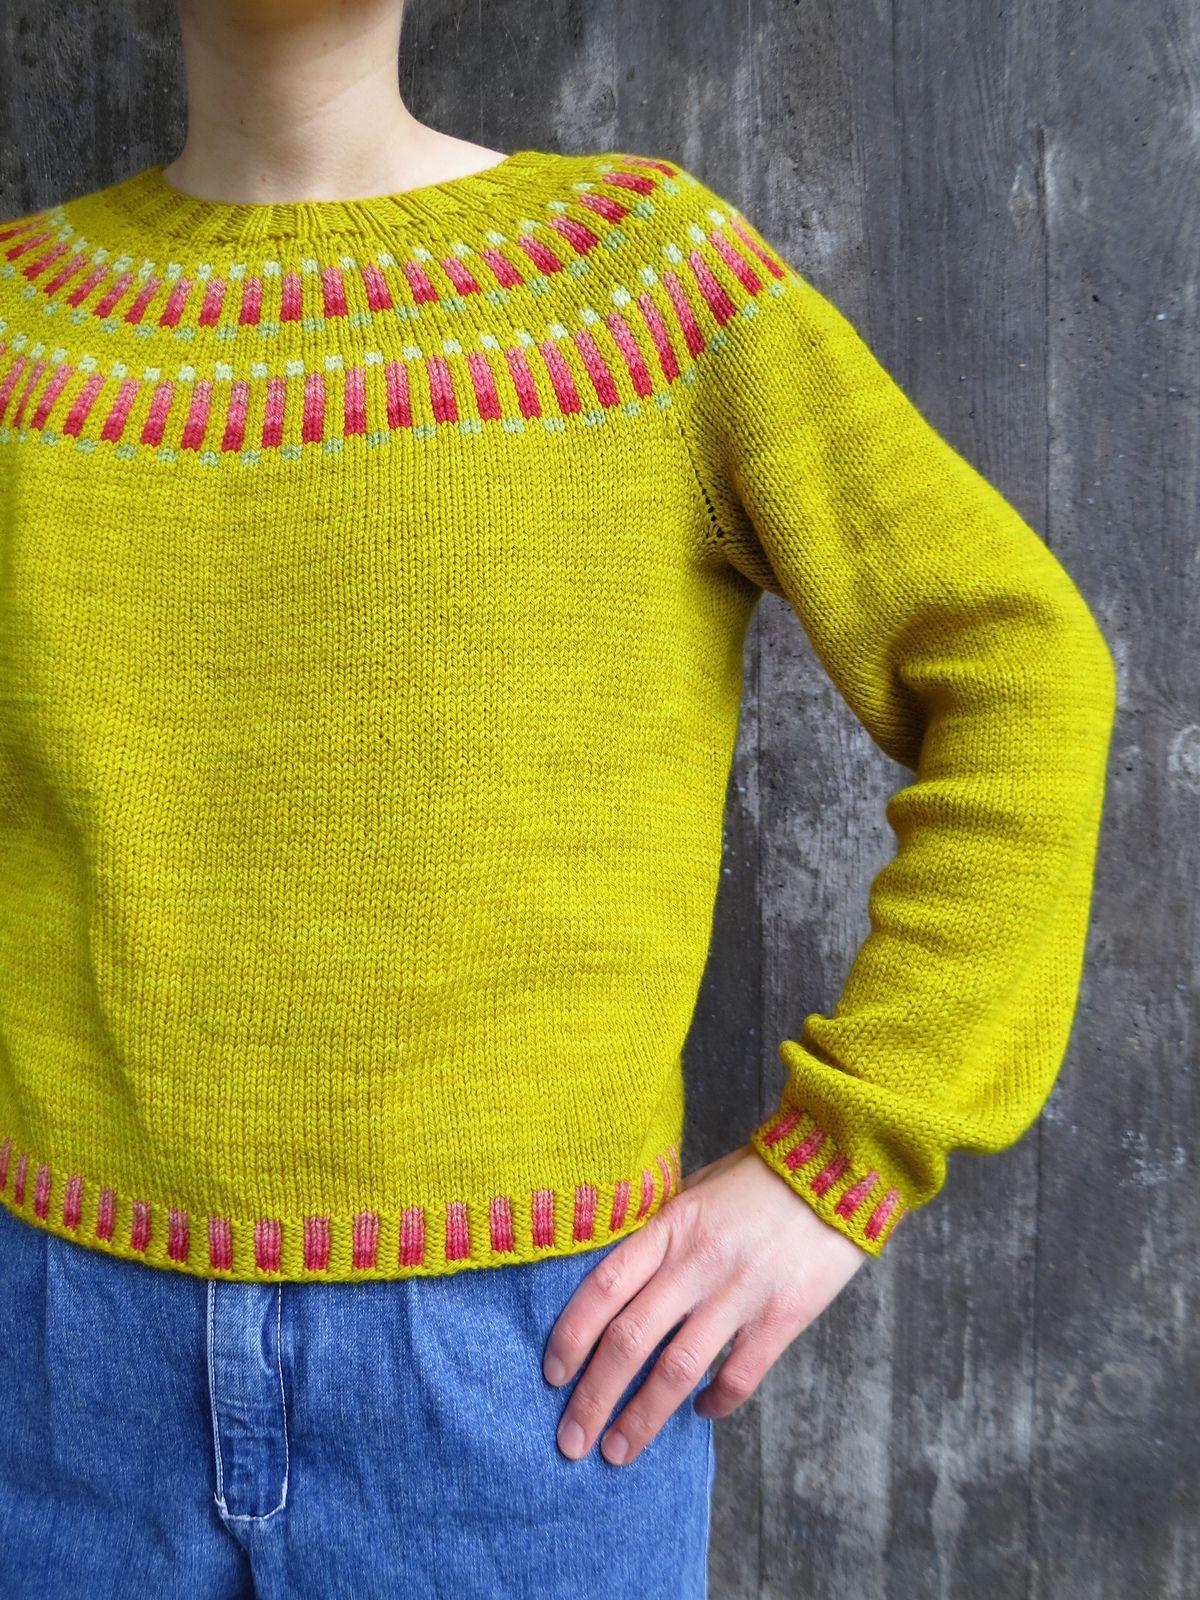 bbebf4429 Flöjten Sweater pattern by The Weststrand Sisters